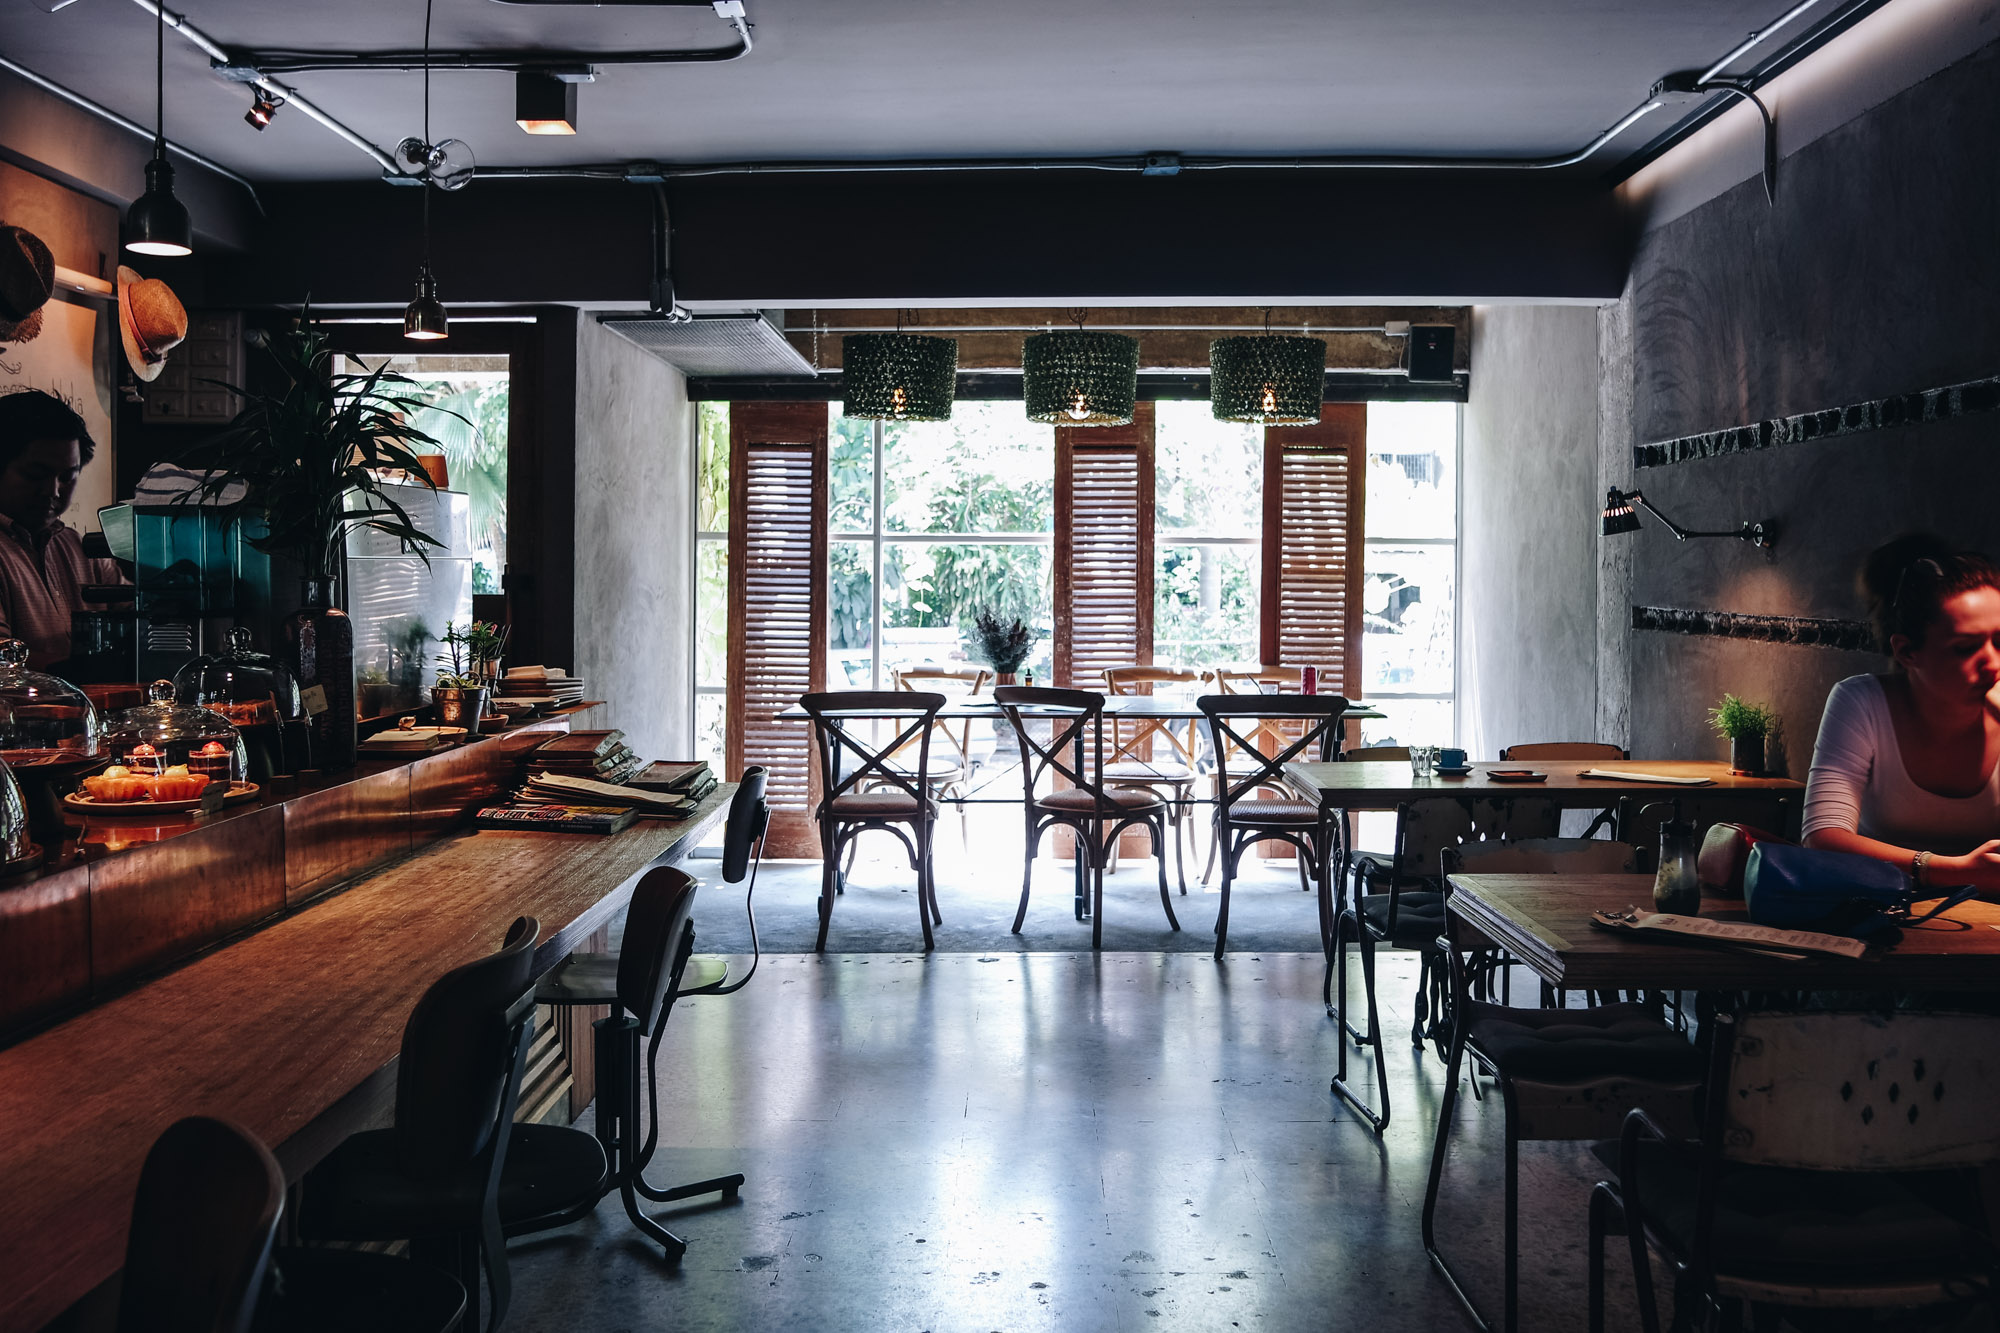 luka-cafe-bangkok-darrenbloggie-5222